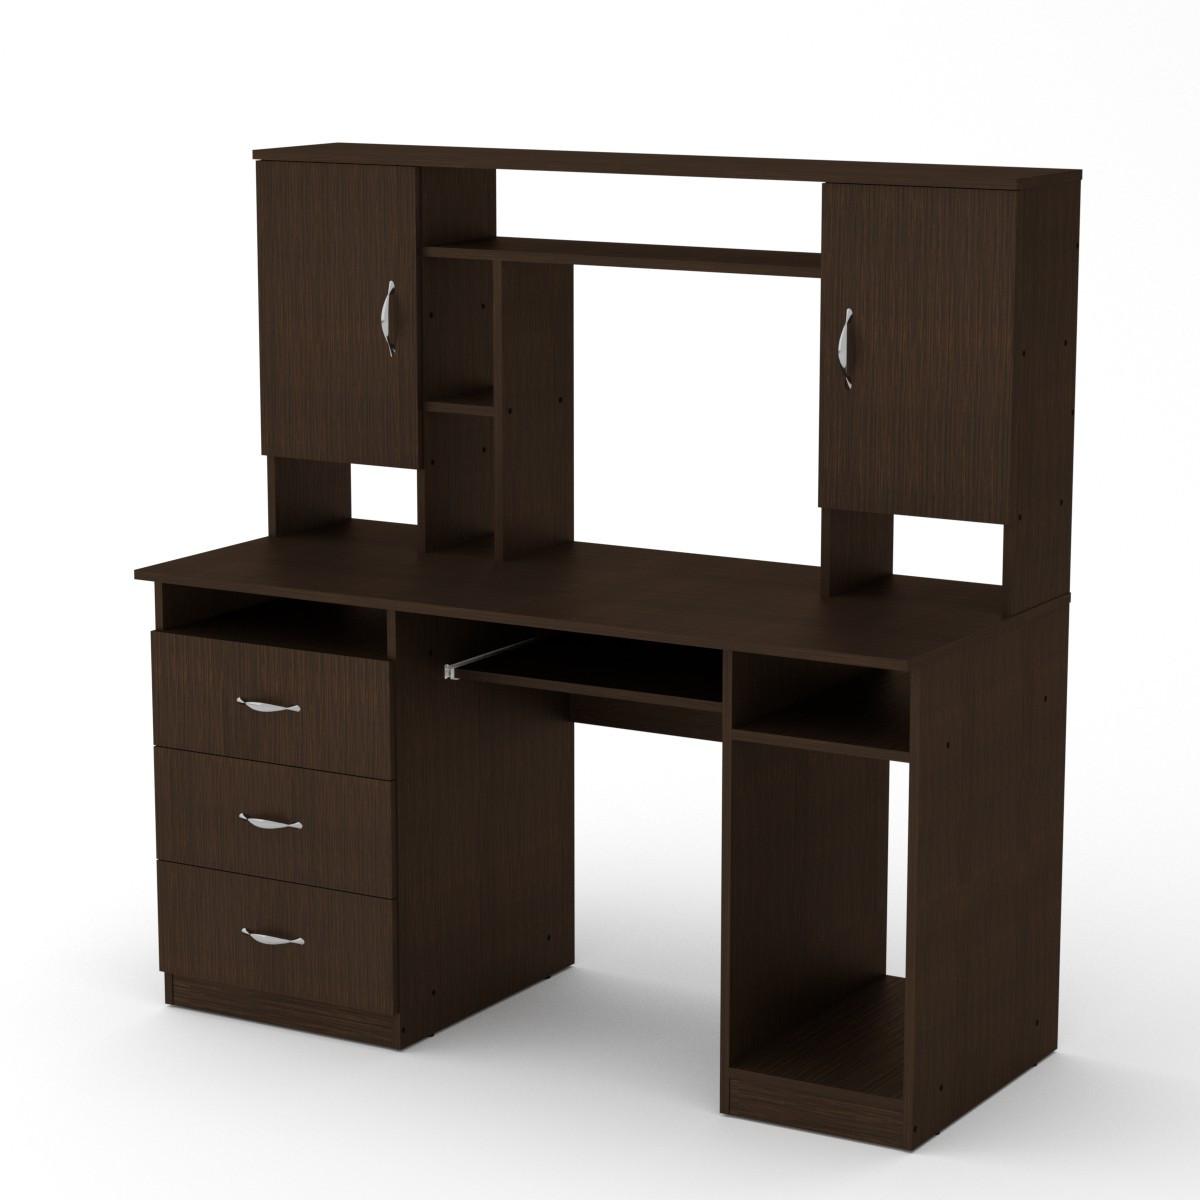 Стол компьютерный менеджер венге Компанит (140х60х142 см)